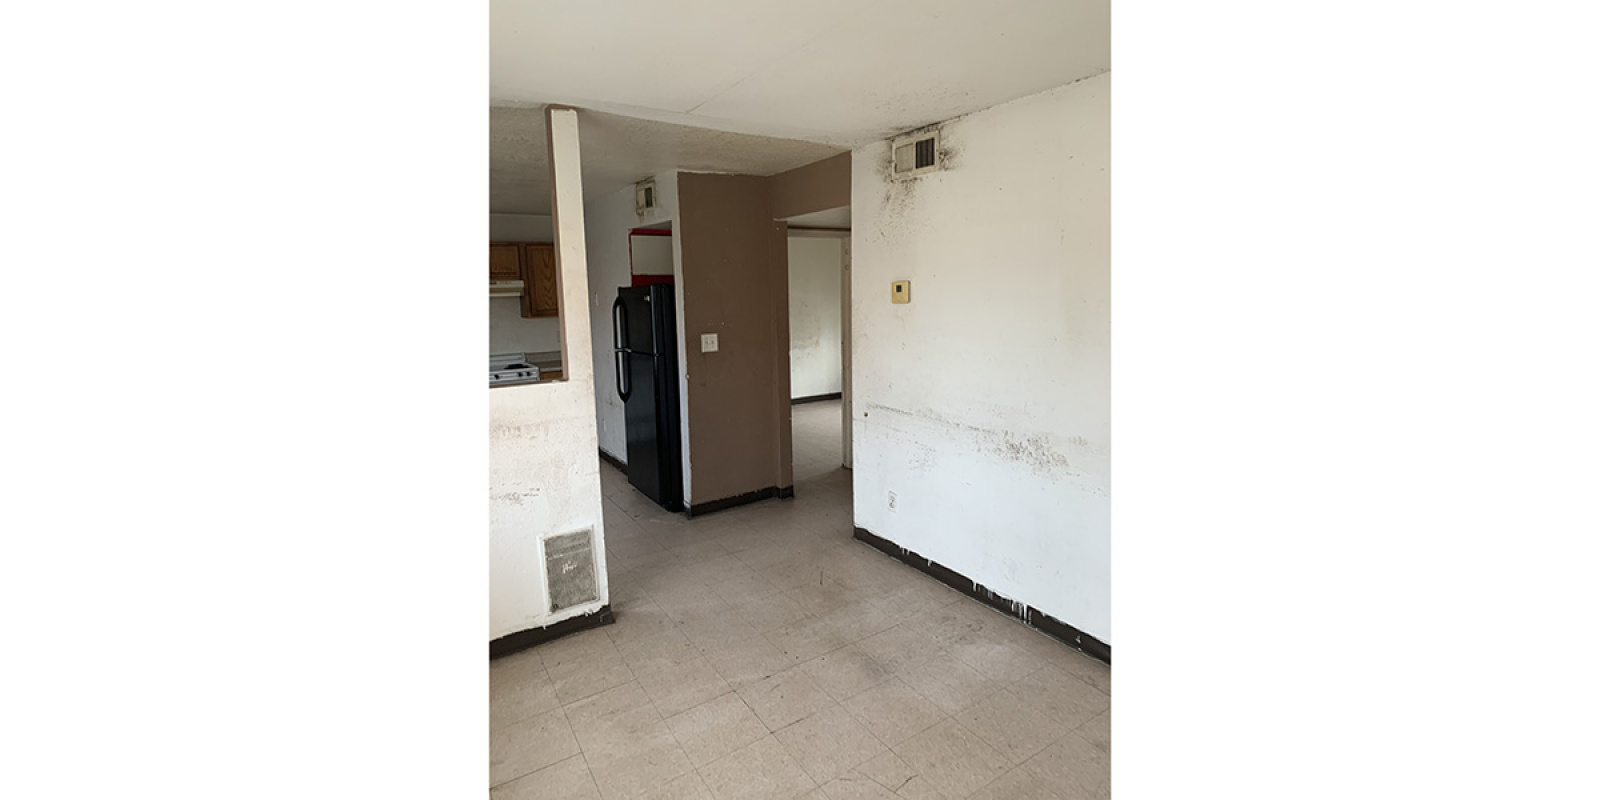 2225 E Wood St, Phoenix, Arizona 85040, 2 Bedrooms Bedrooms, ,1 BathroomBathrooms,Multi-Family,Available,E Wood St,1241